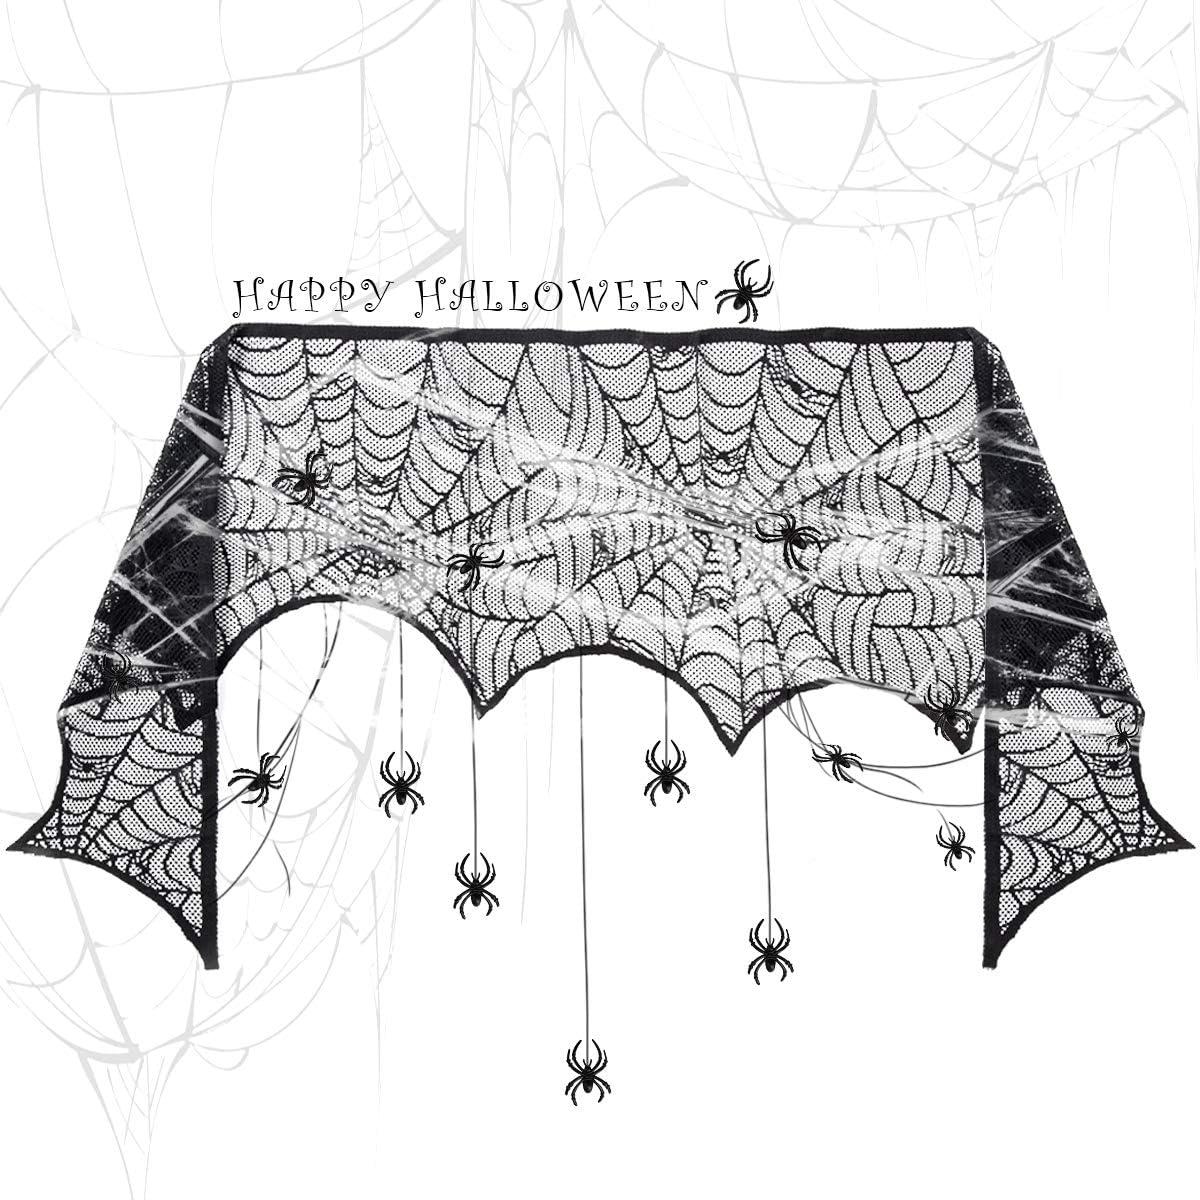 GIGALUMI tela de encaje de tela de ara/ña de Halloween 60 g telara/ñas 30 ara/ñas de terror Halloween ara/ña telara/ña decoraci/ón conjunto para Halloween decoraci/ón fiesta carnaval